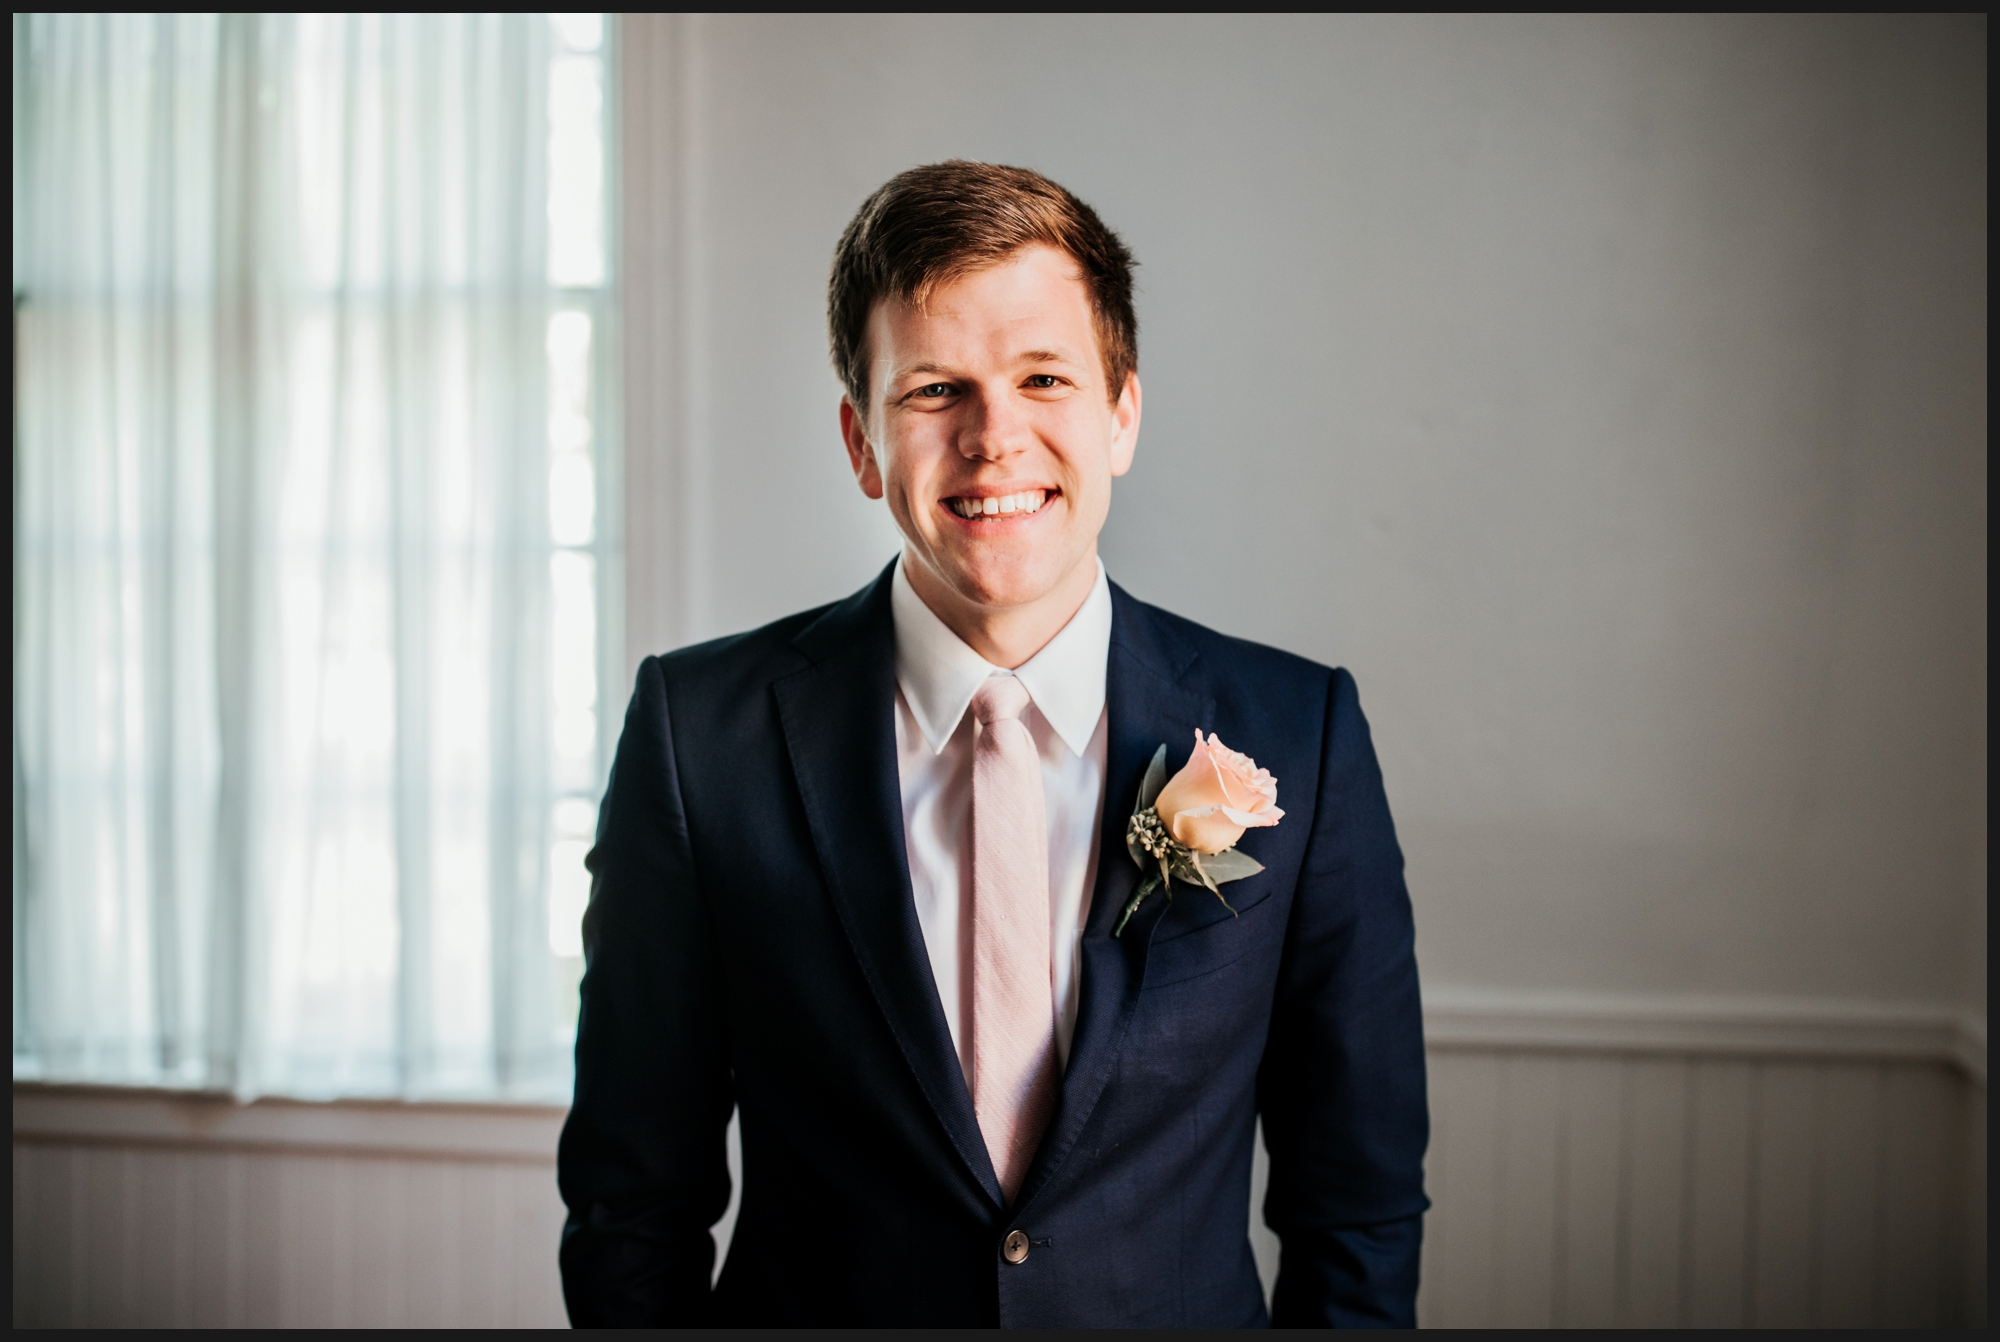 Orlando-Wedding-Photographer-destination-wedding-photographer-florida-wedding-photographer-bohemian-wedding-photographer_1732.jpg